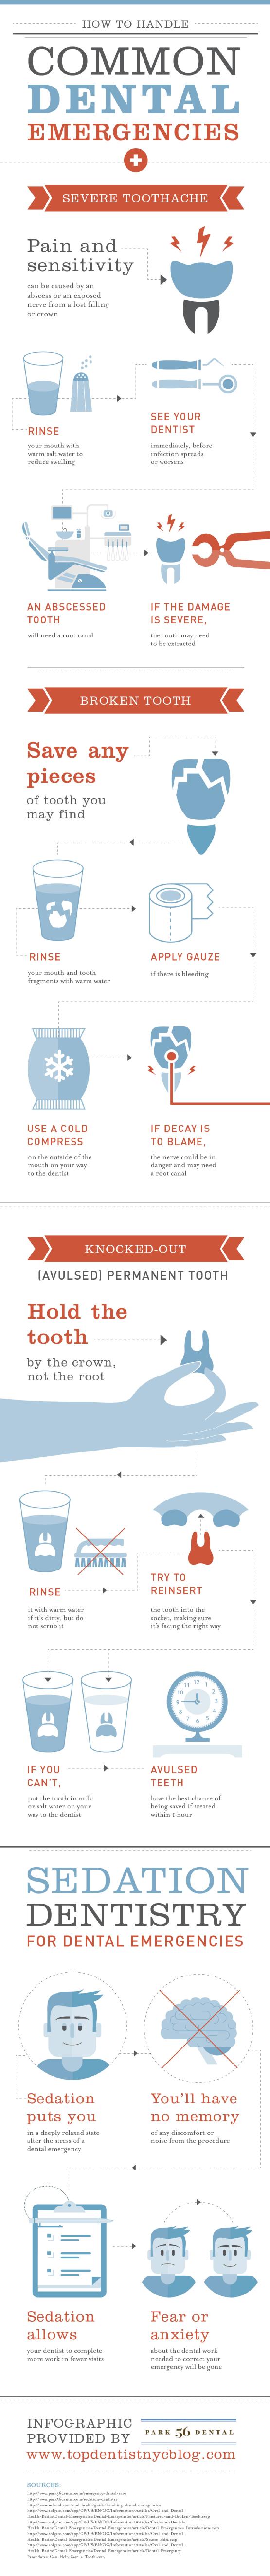 How To Handle common Dental Emergencies